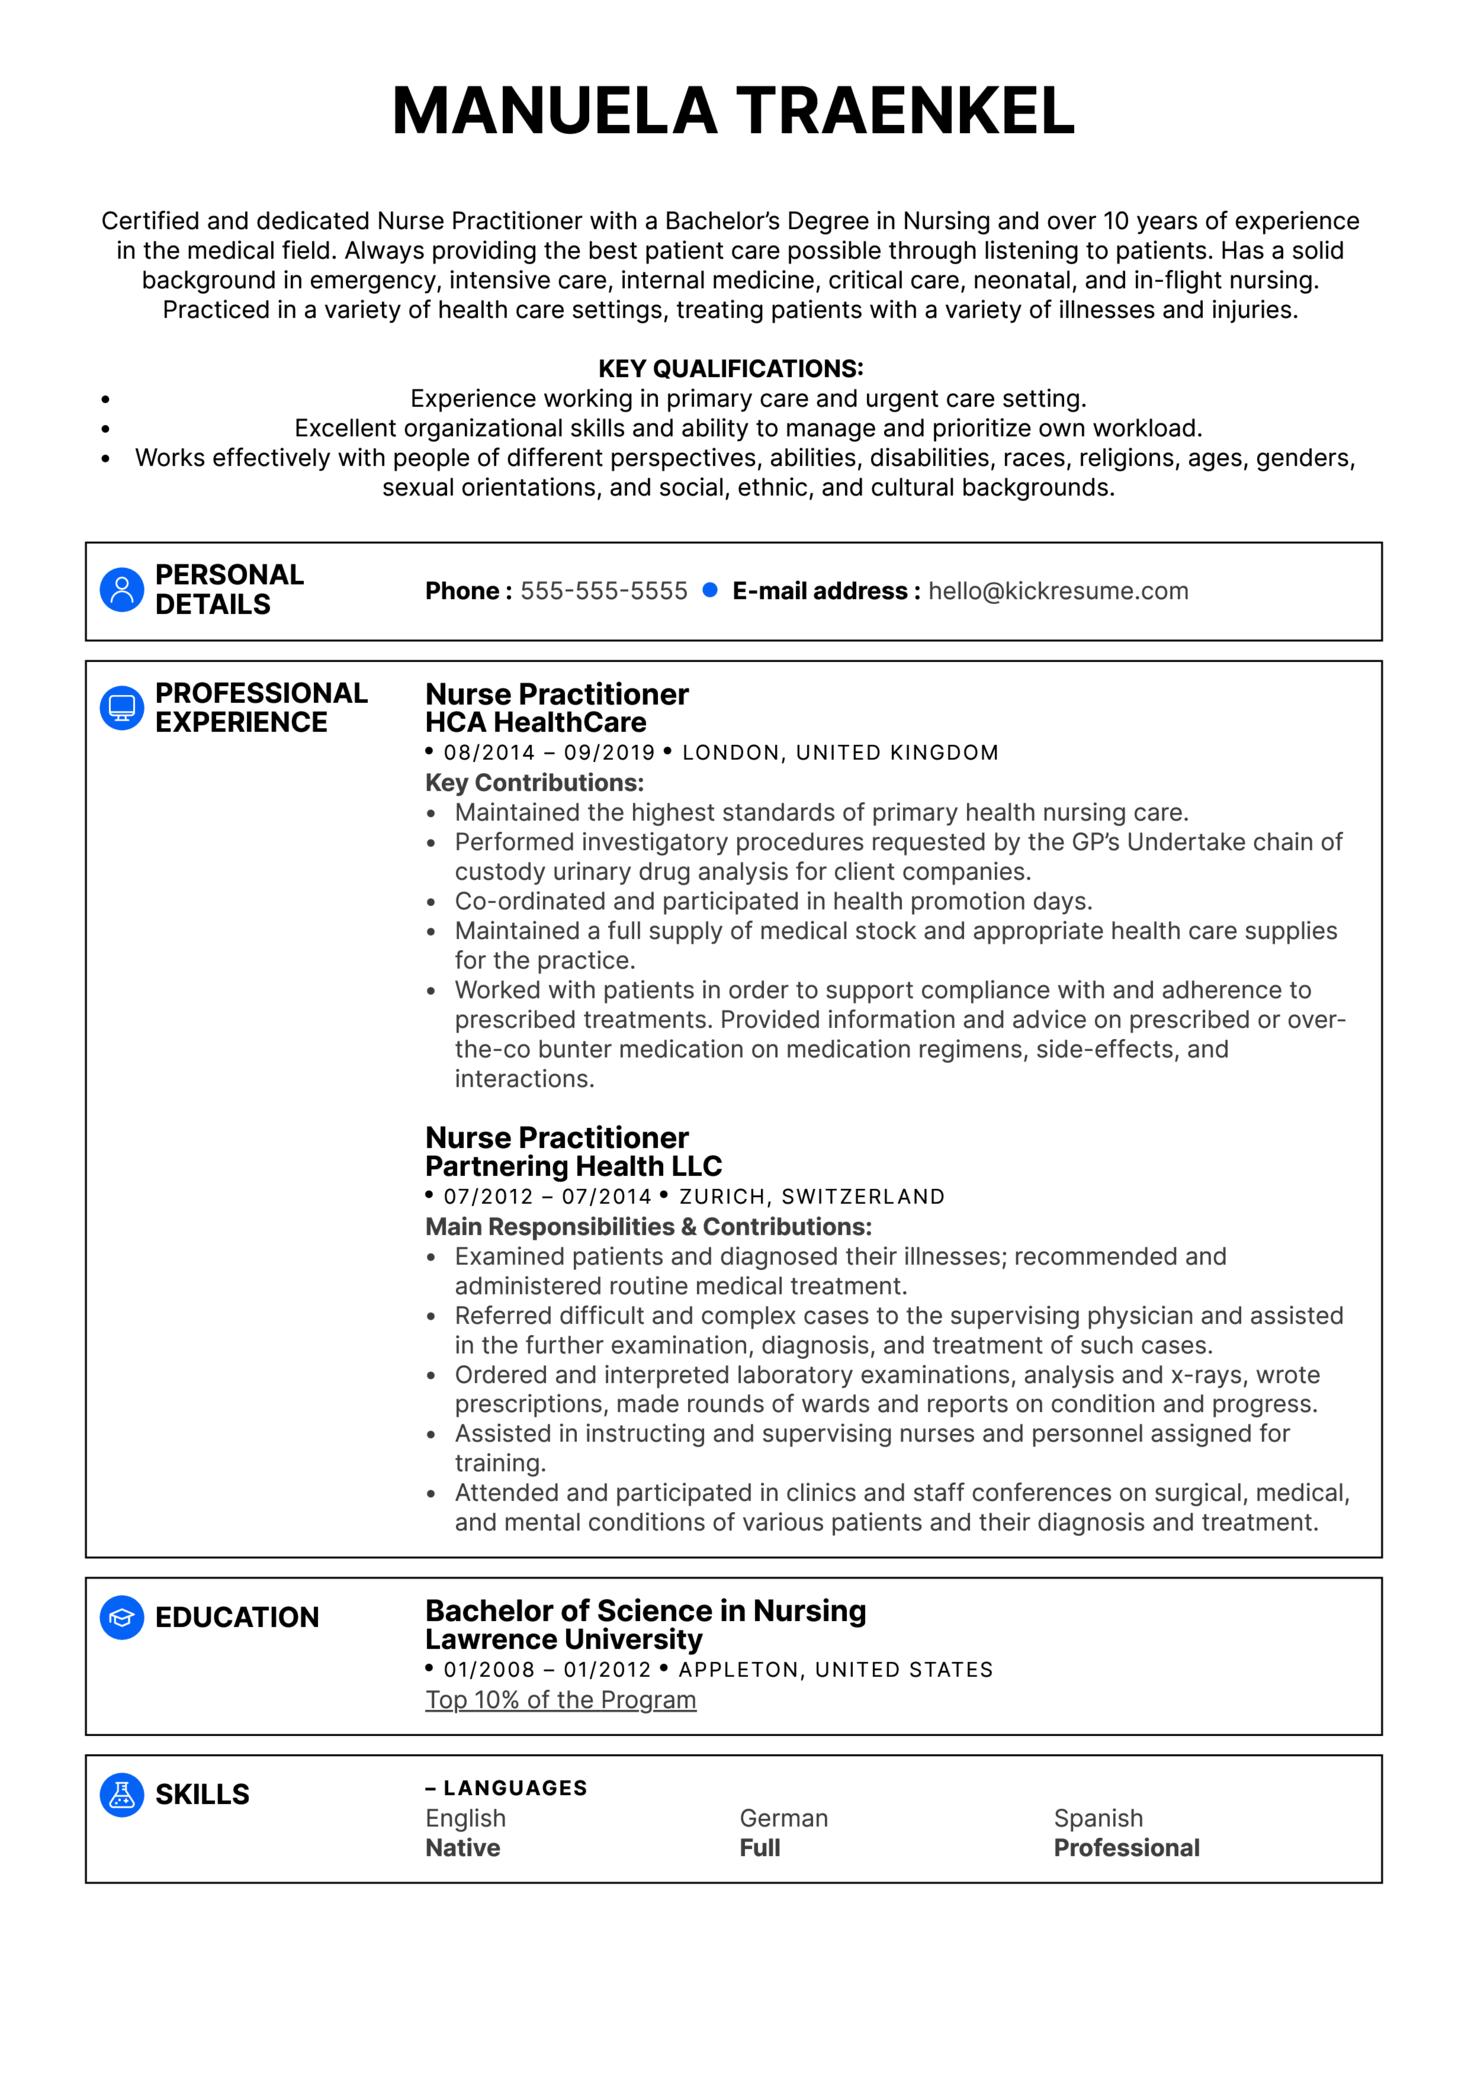 Nurse Practitioner Resume Example (Part 1)